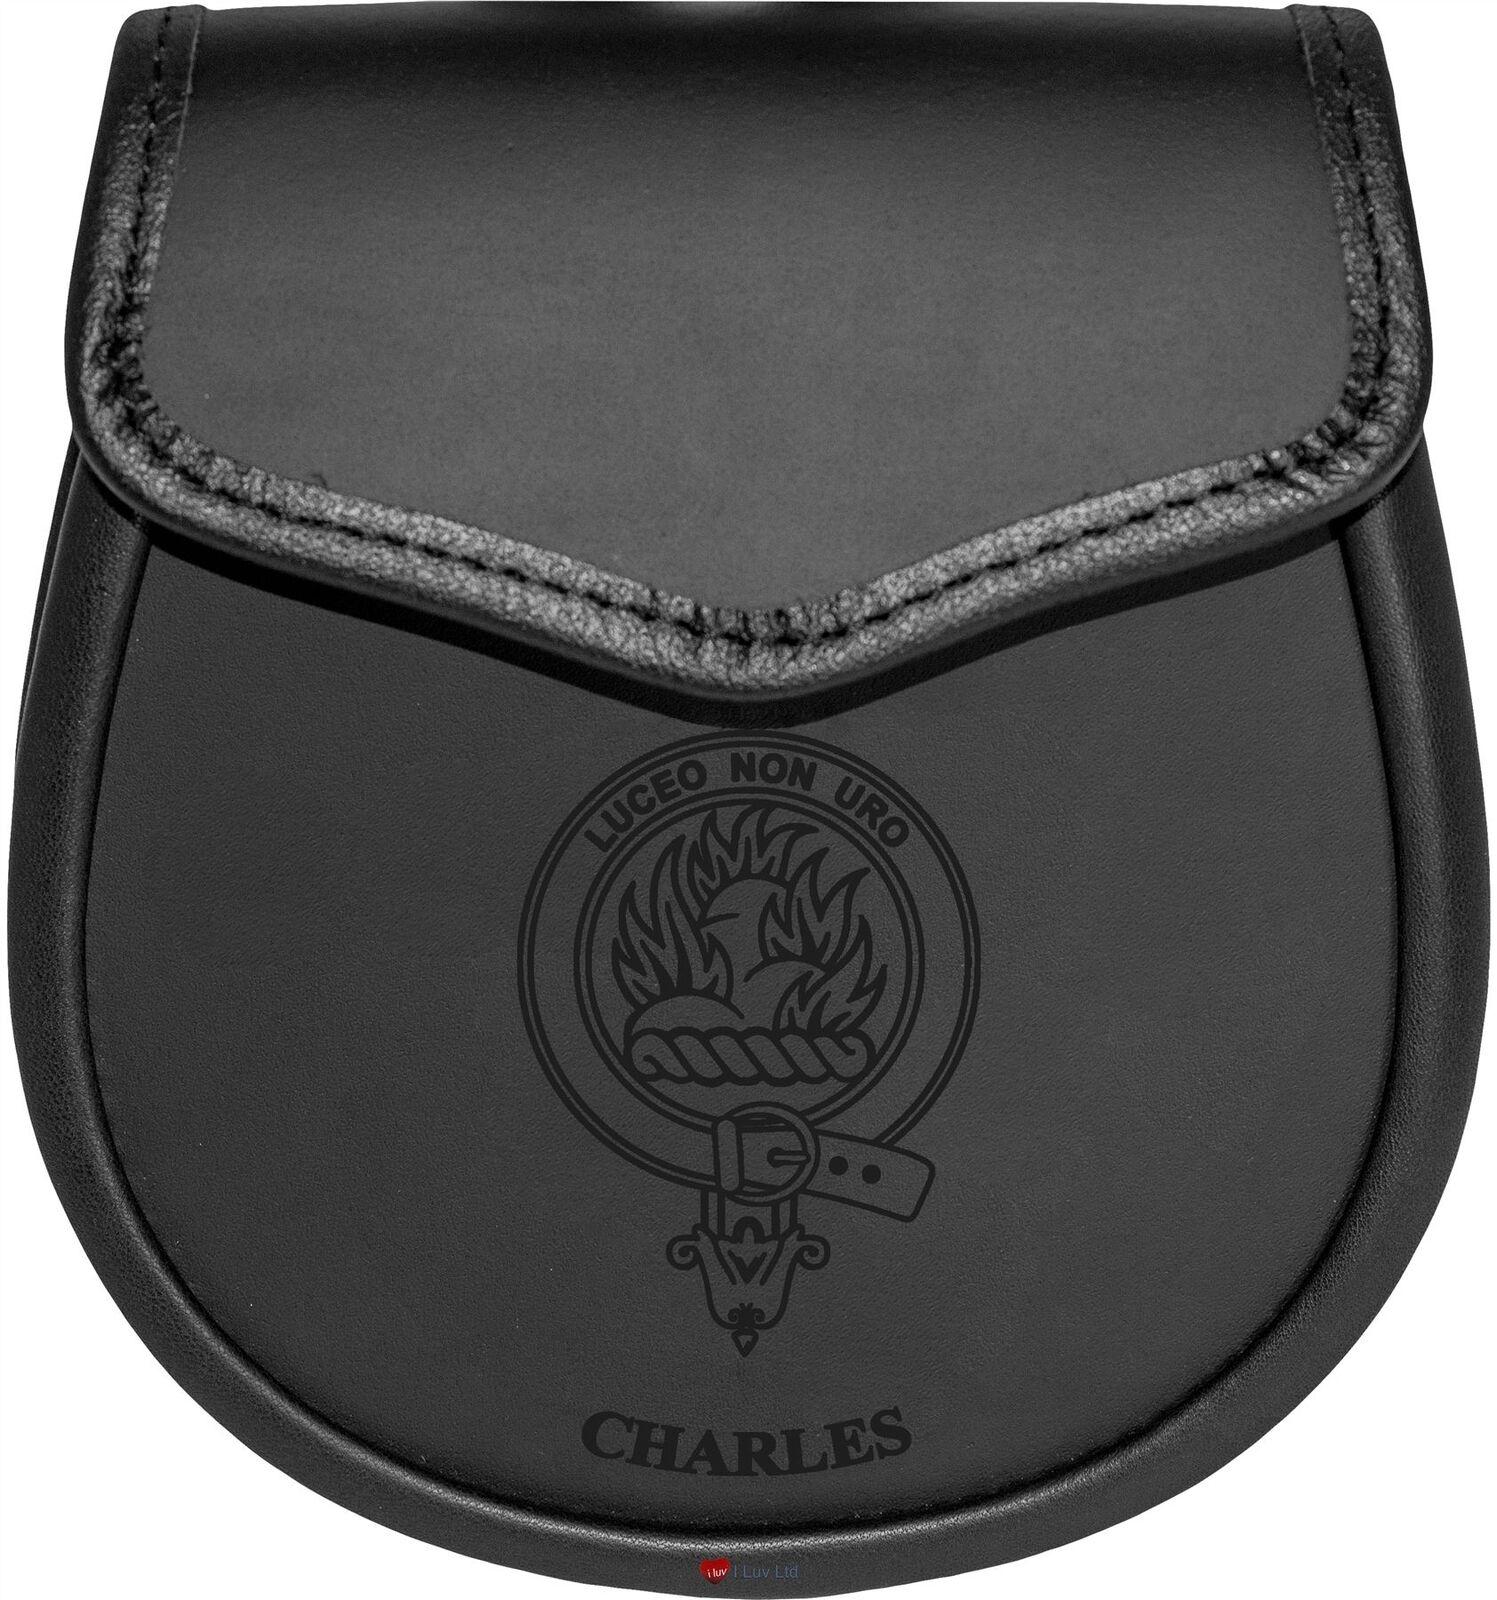 Charles Cheyne Leather Day Sporran Scottish Clan Crest